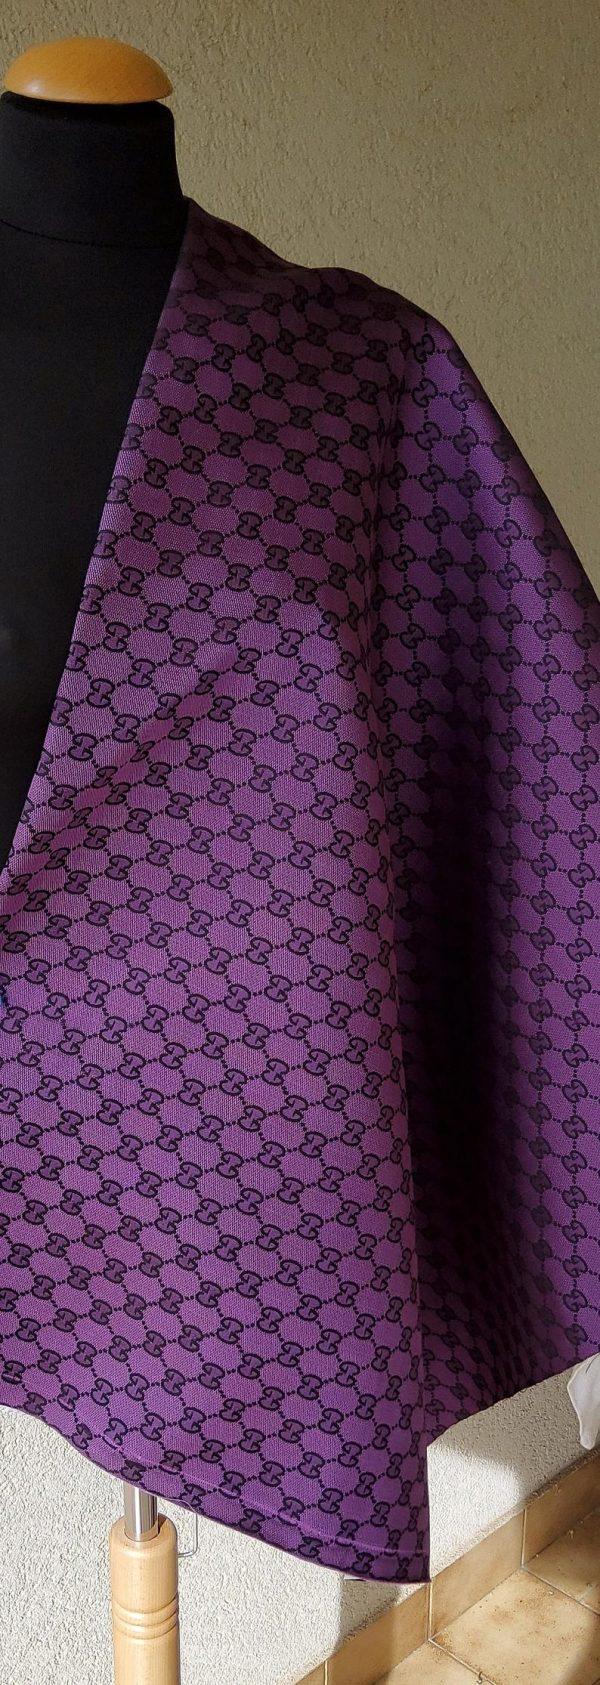 Gucci Jacquard Monogram Print in Purple and Black/ Designer Gucci Fabric/Jacket Jacquard Fabric/Jacquard Couture Fabric Colours Available 2 ⋆ Rozitta Rapetti